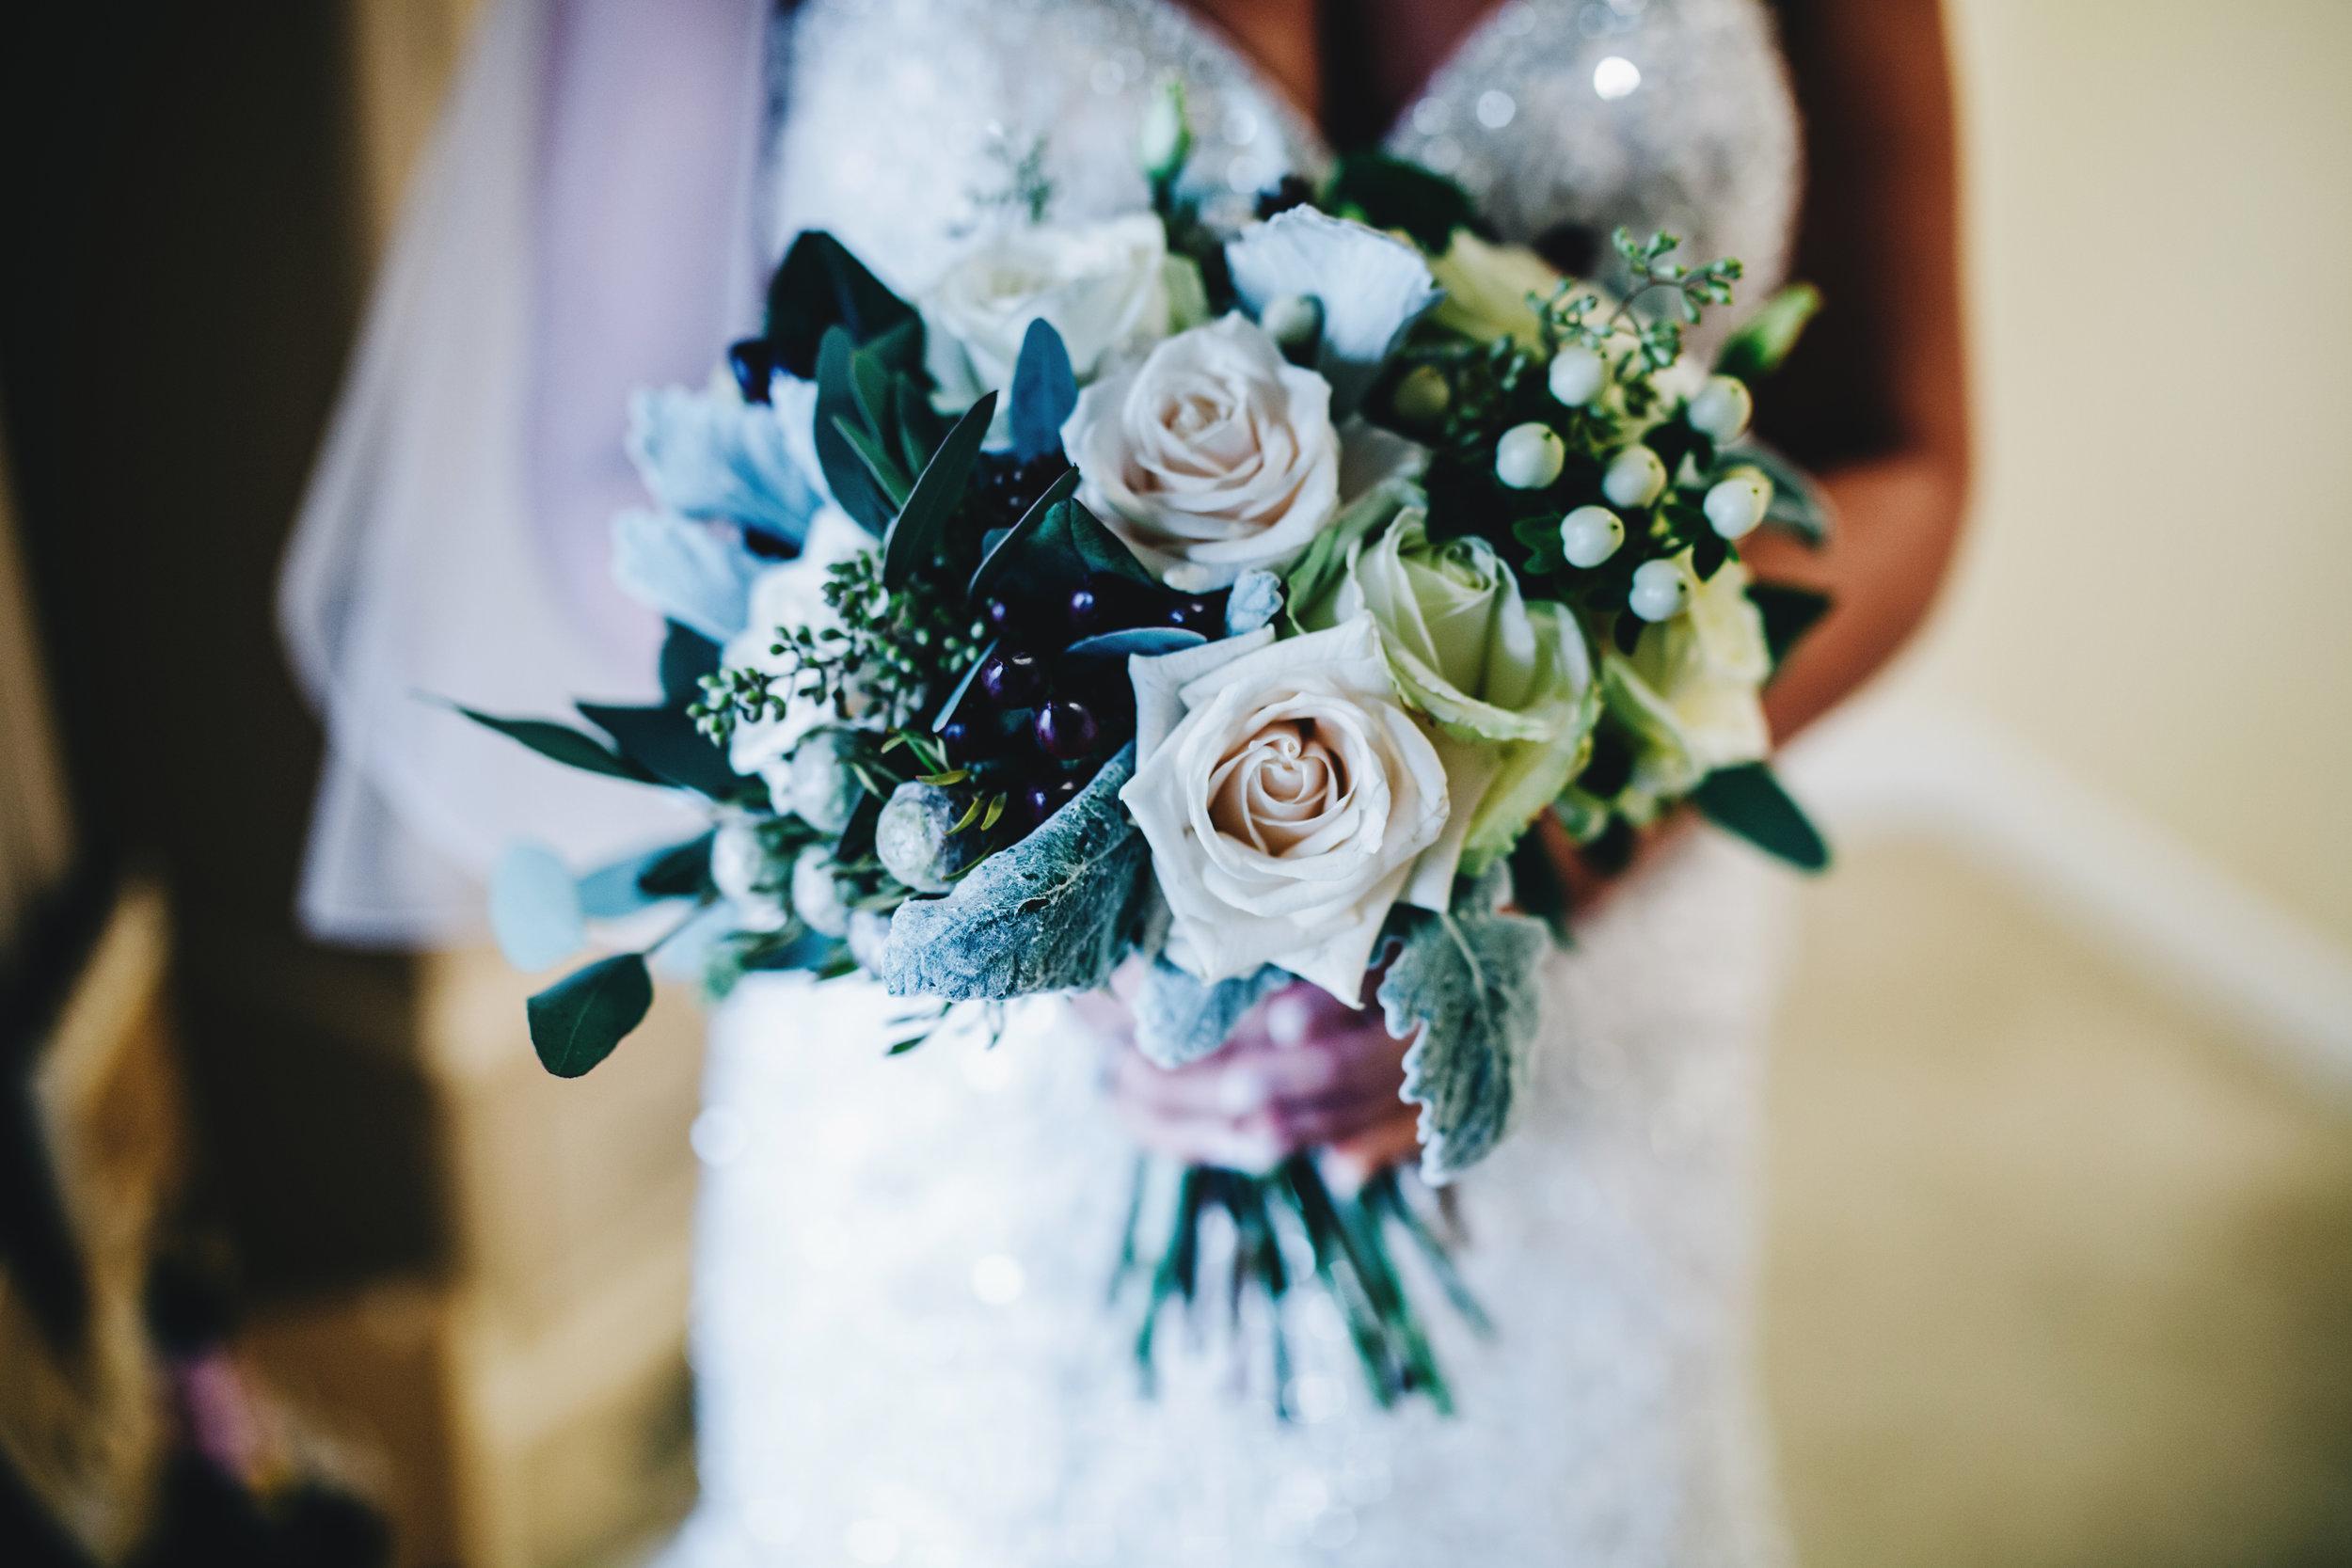 close up of the bride's bouquet